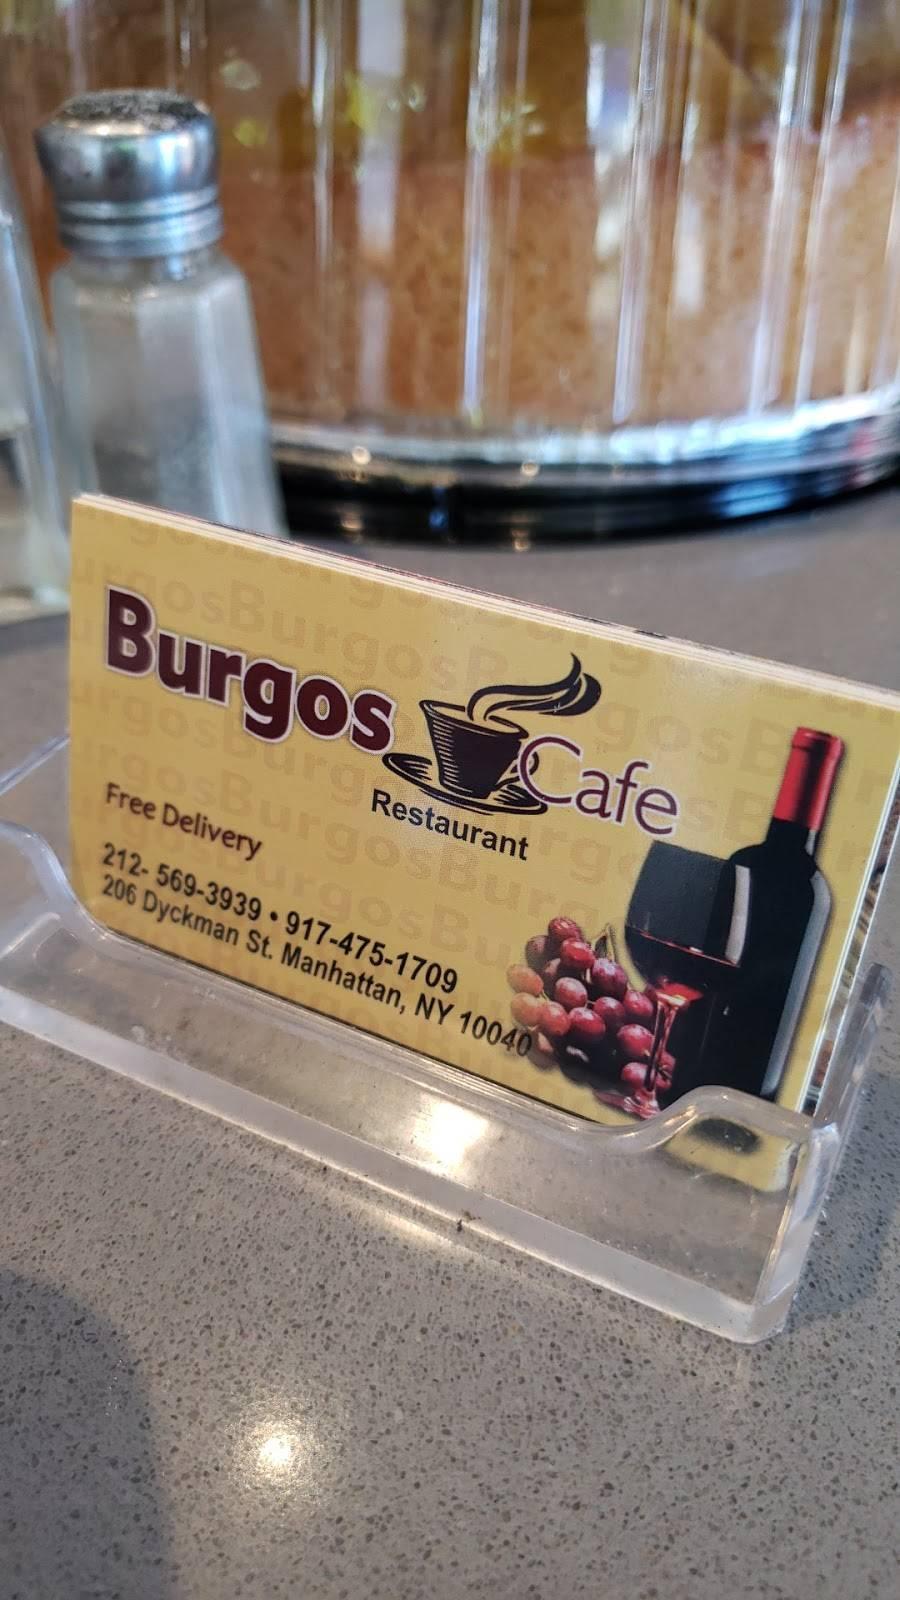 Burgos Restaurant cafe   restaurant   200/10 Dyckman St, New York, NY 10040, USA   2125693939 OR +1 212-569-3939